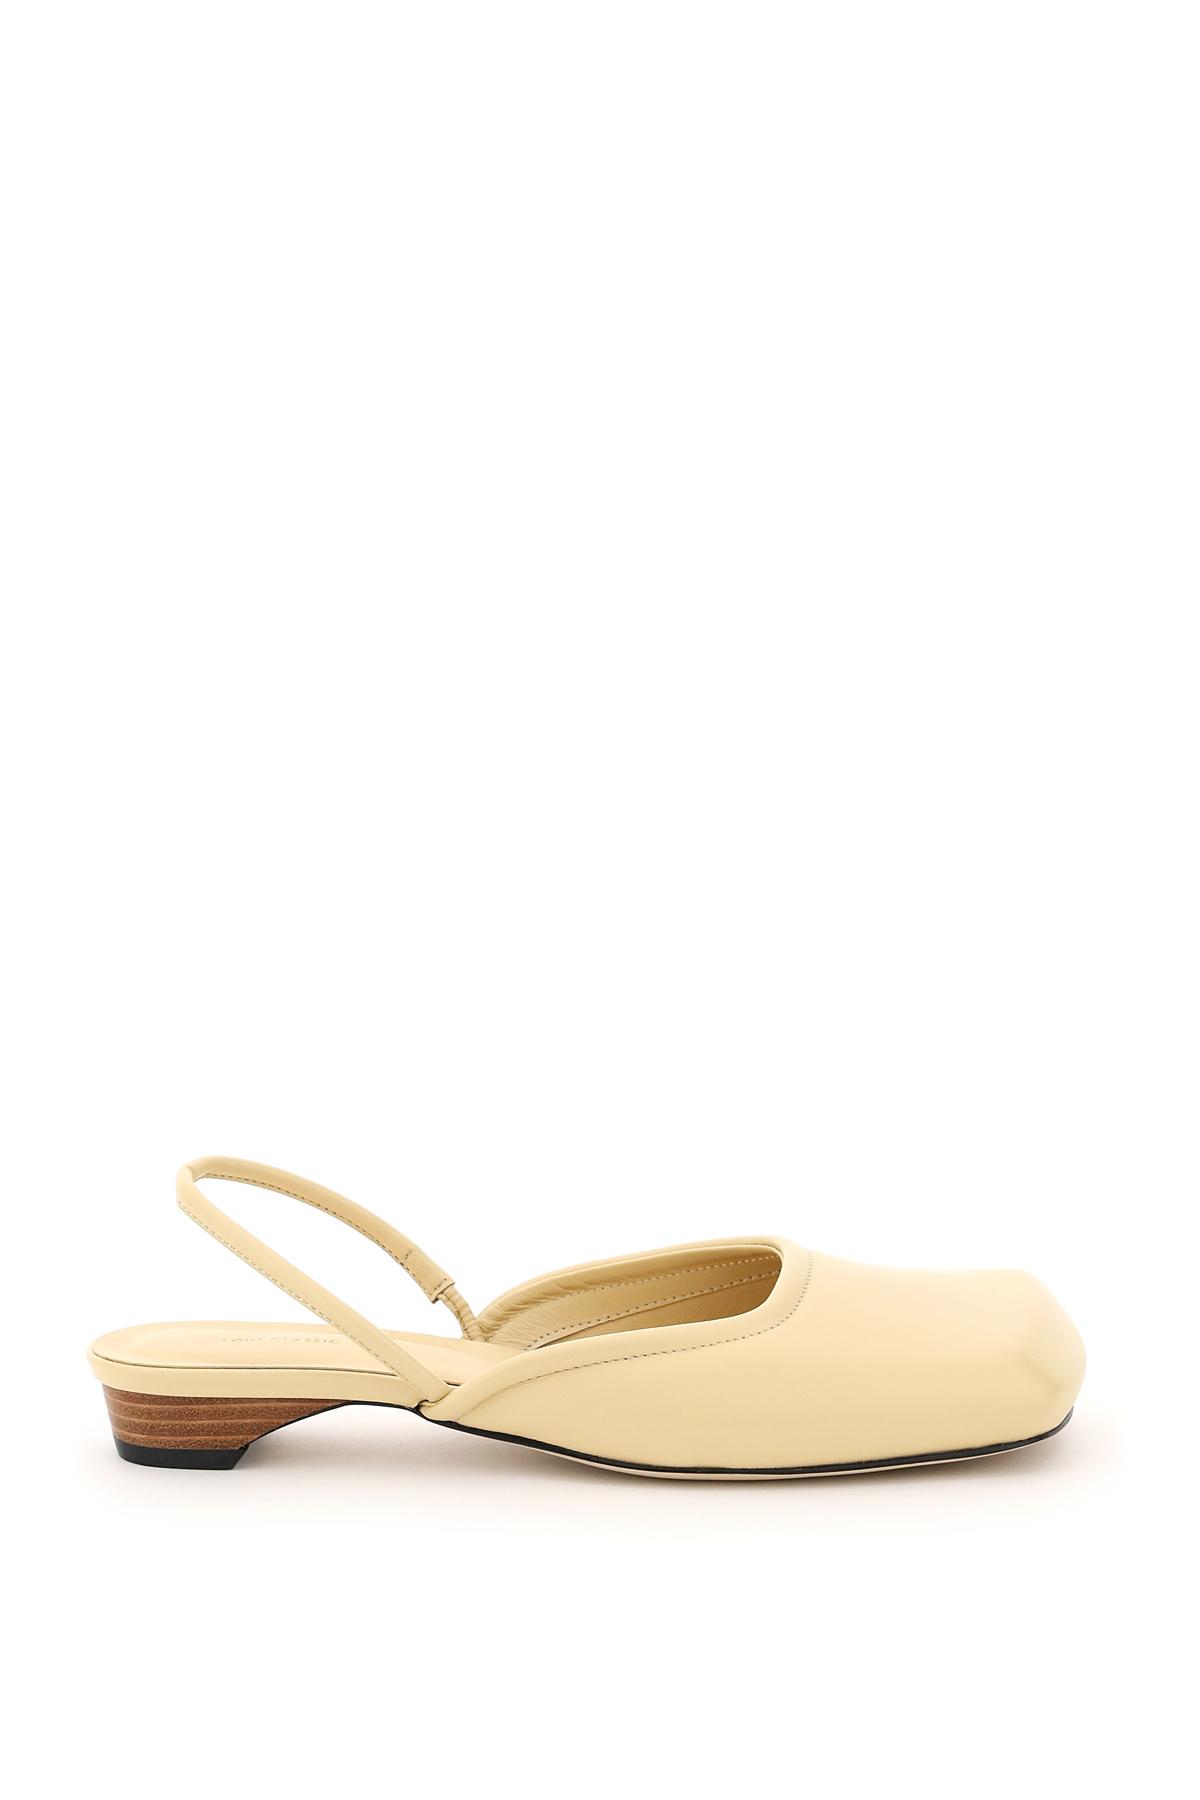 Low classic slingback squared toe sandal